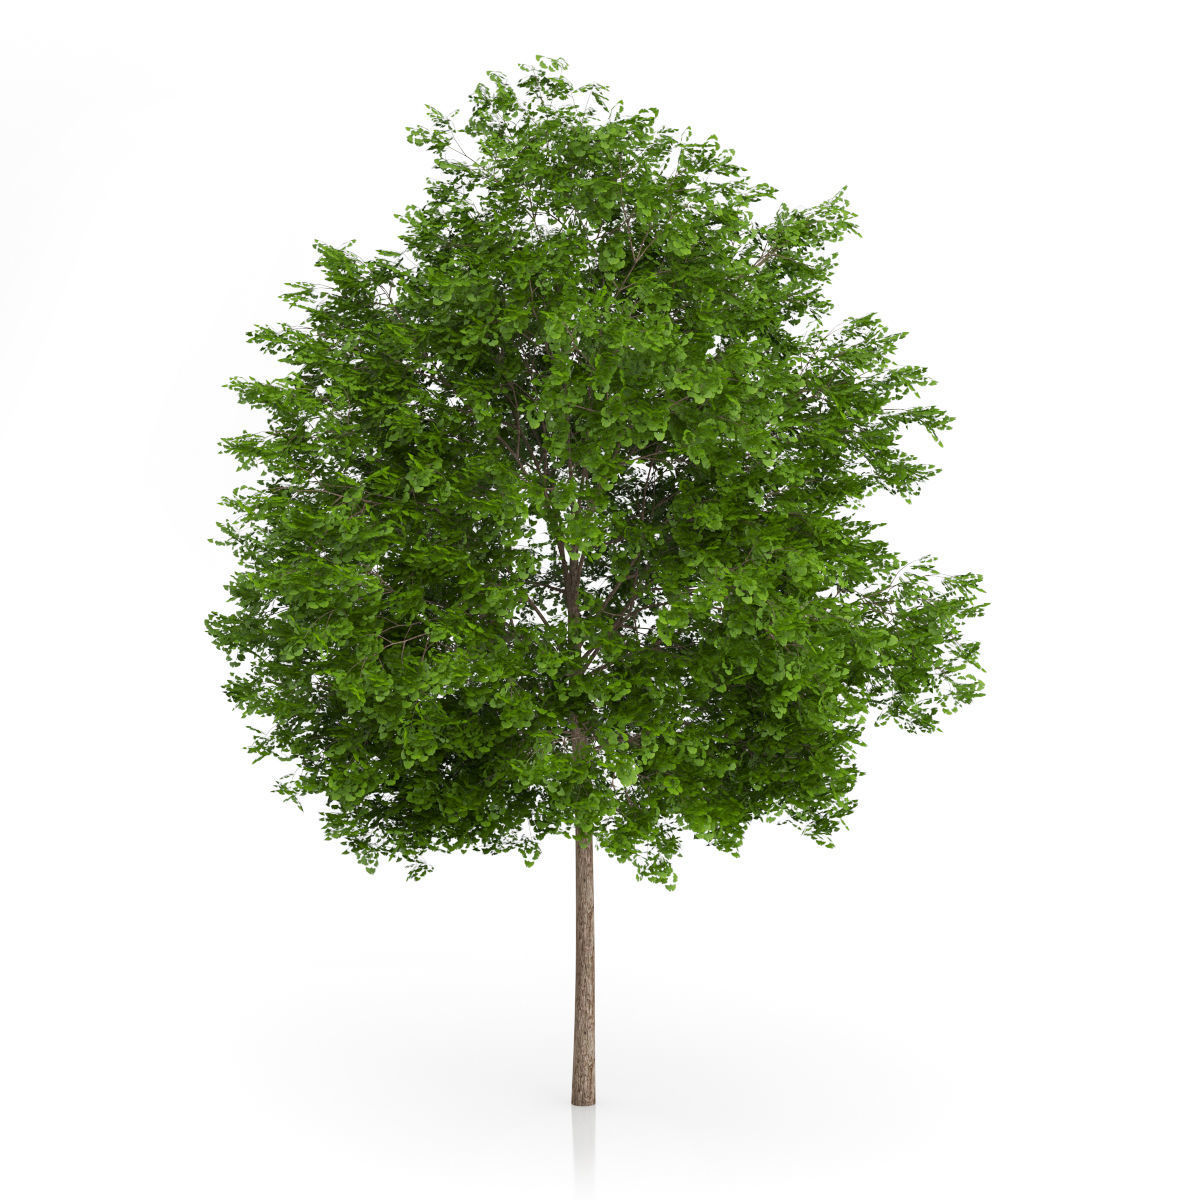 Maidenhair Tree Ginkgo biloba